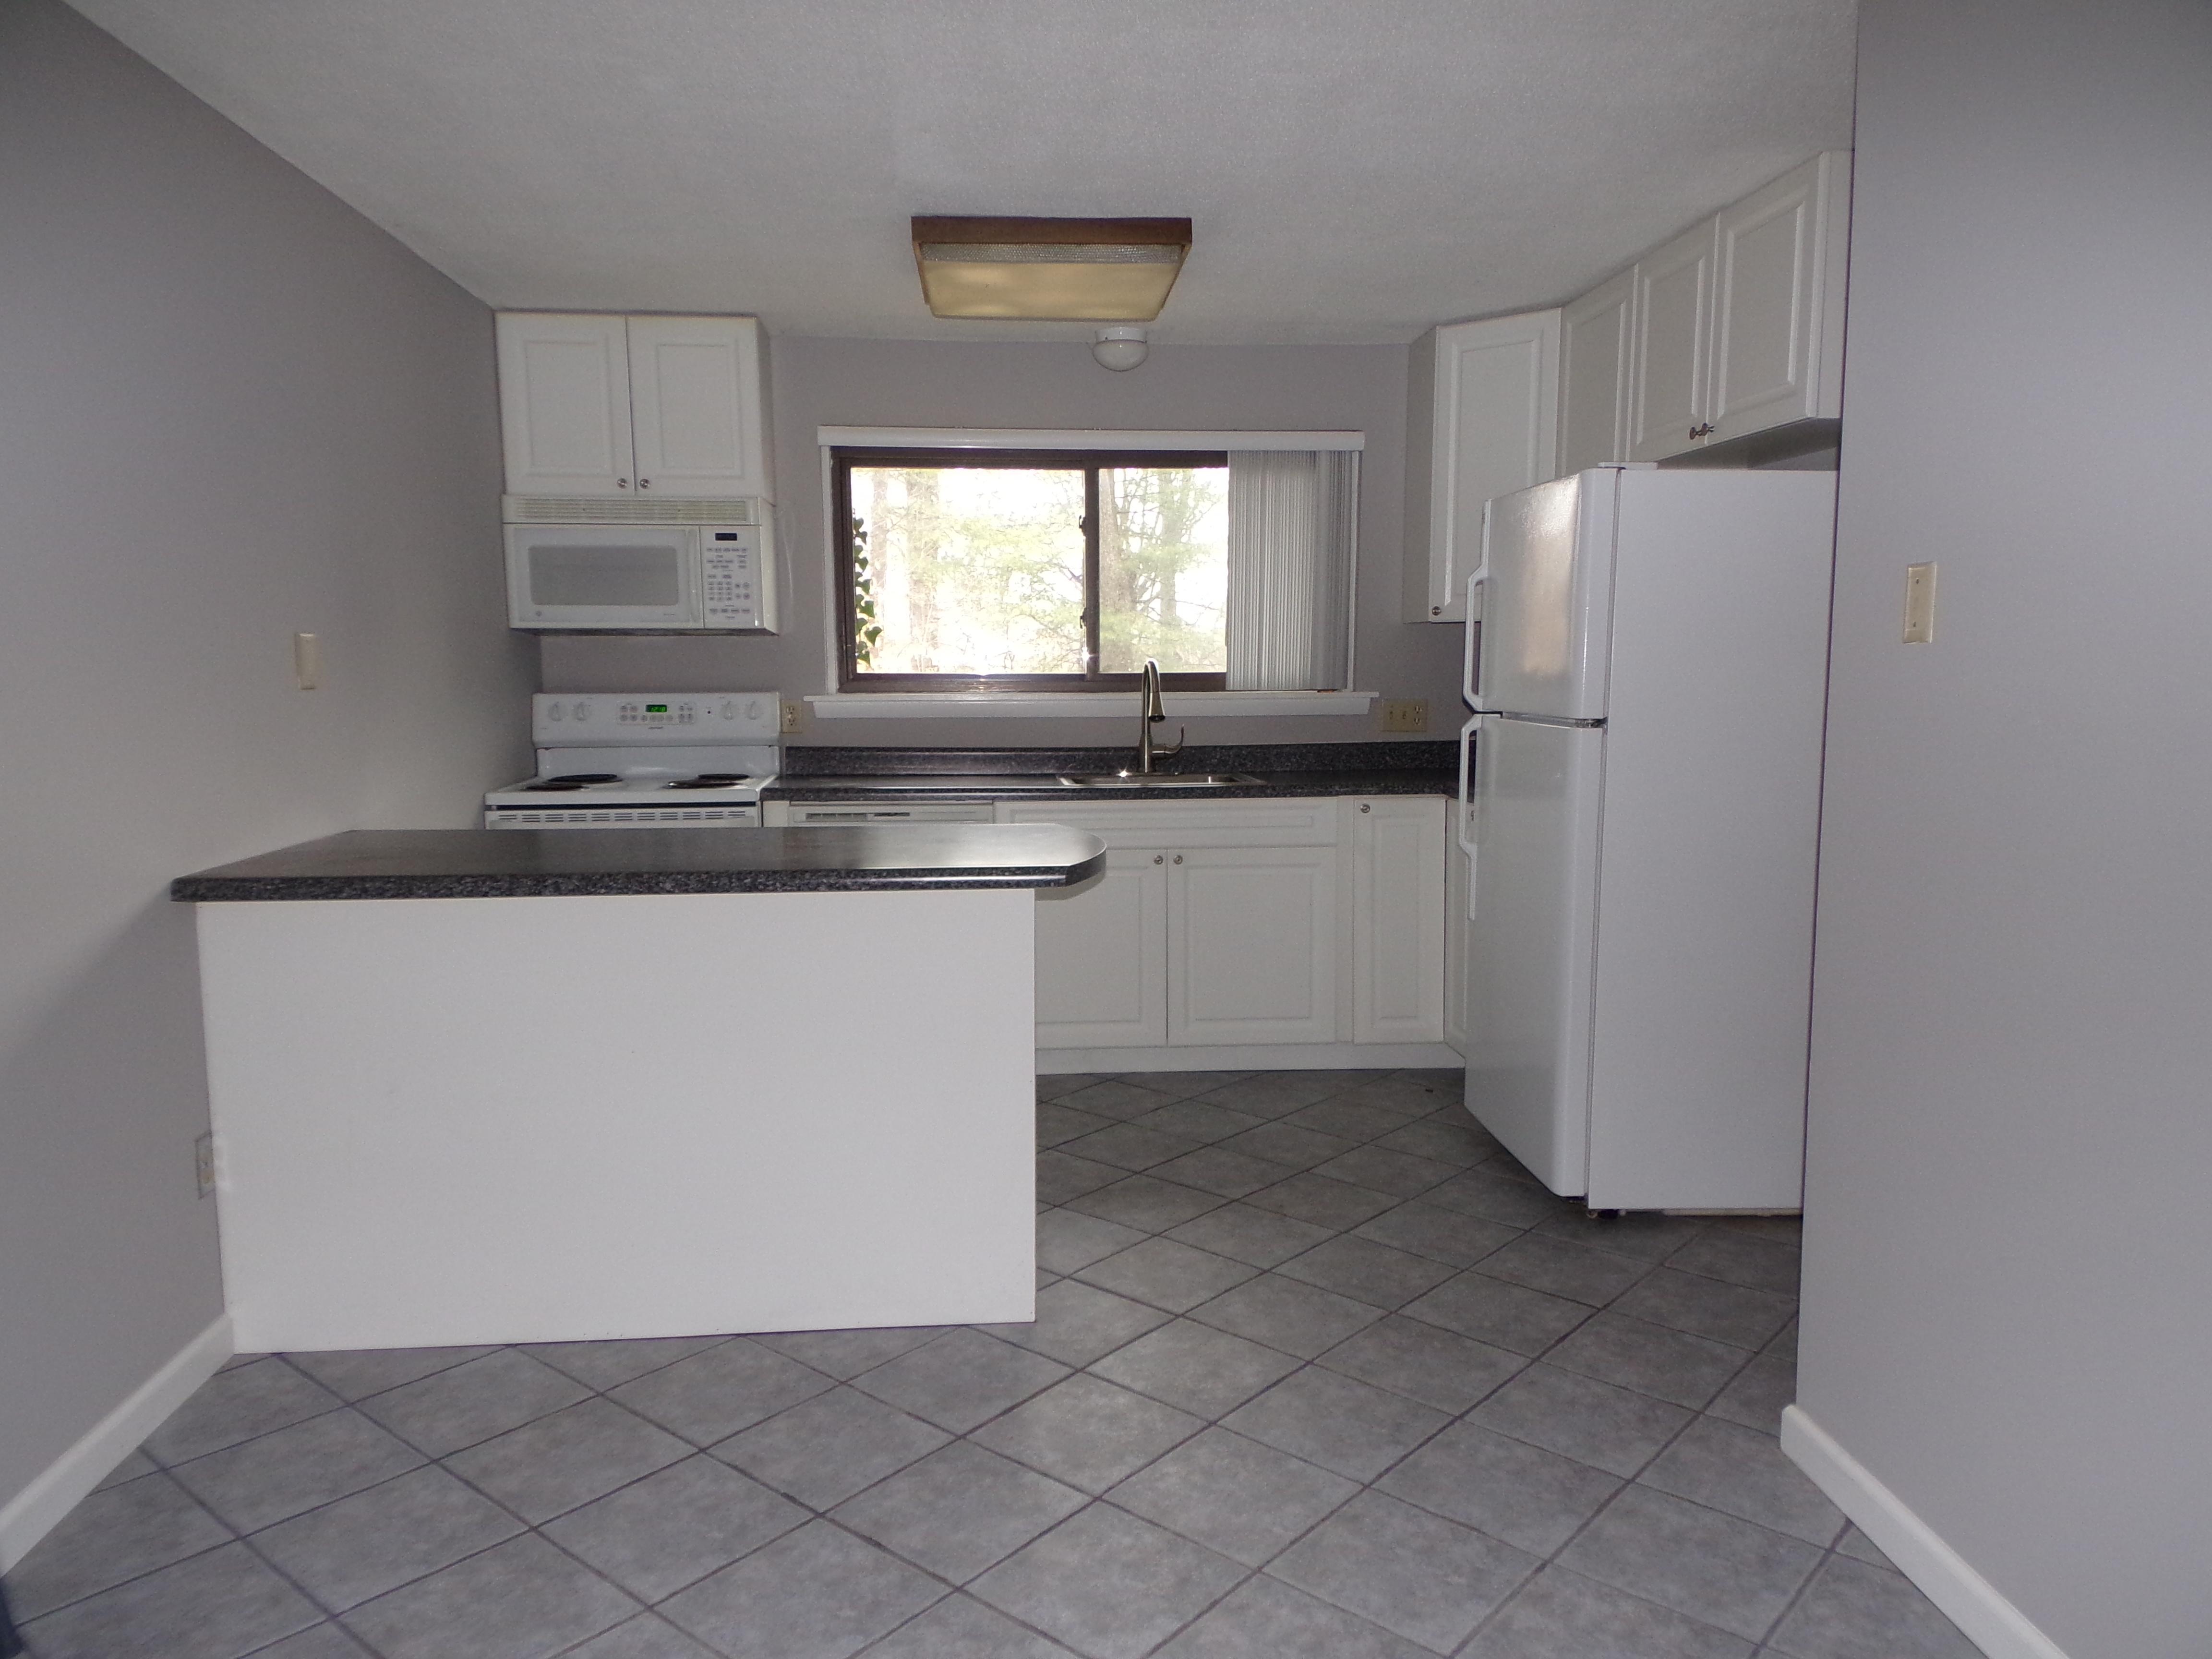 共管式独立产权公寓 为 销售 在 Bright, Open and Just Remodeled 29 Conestoga Way 29 Glastonbury, 康涅狄格州, 06033 美国